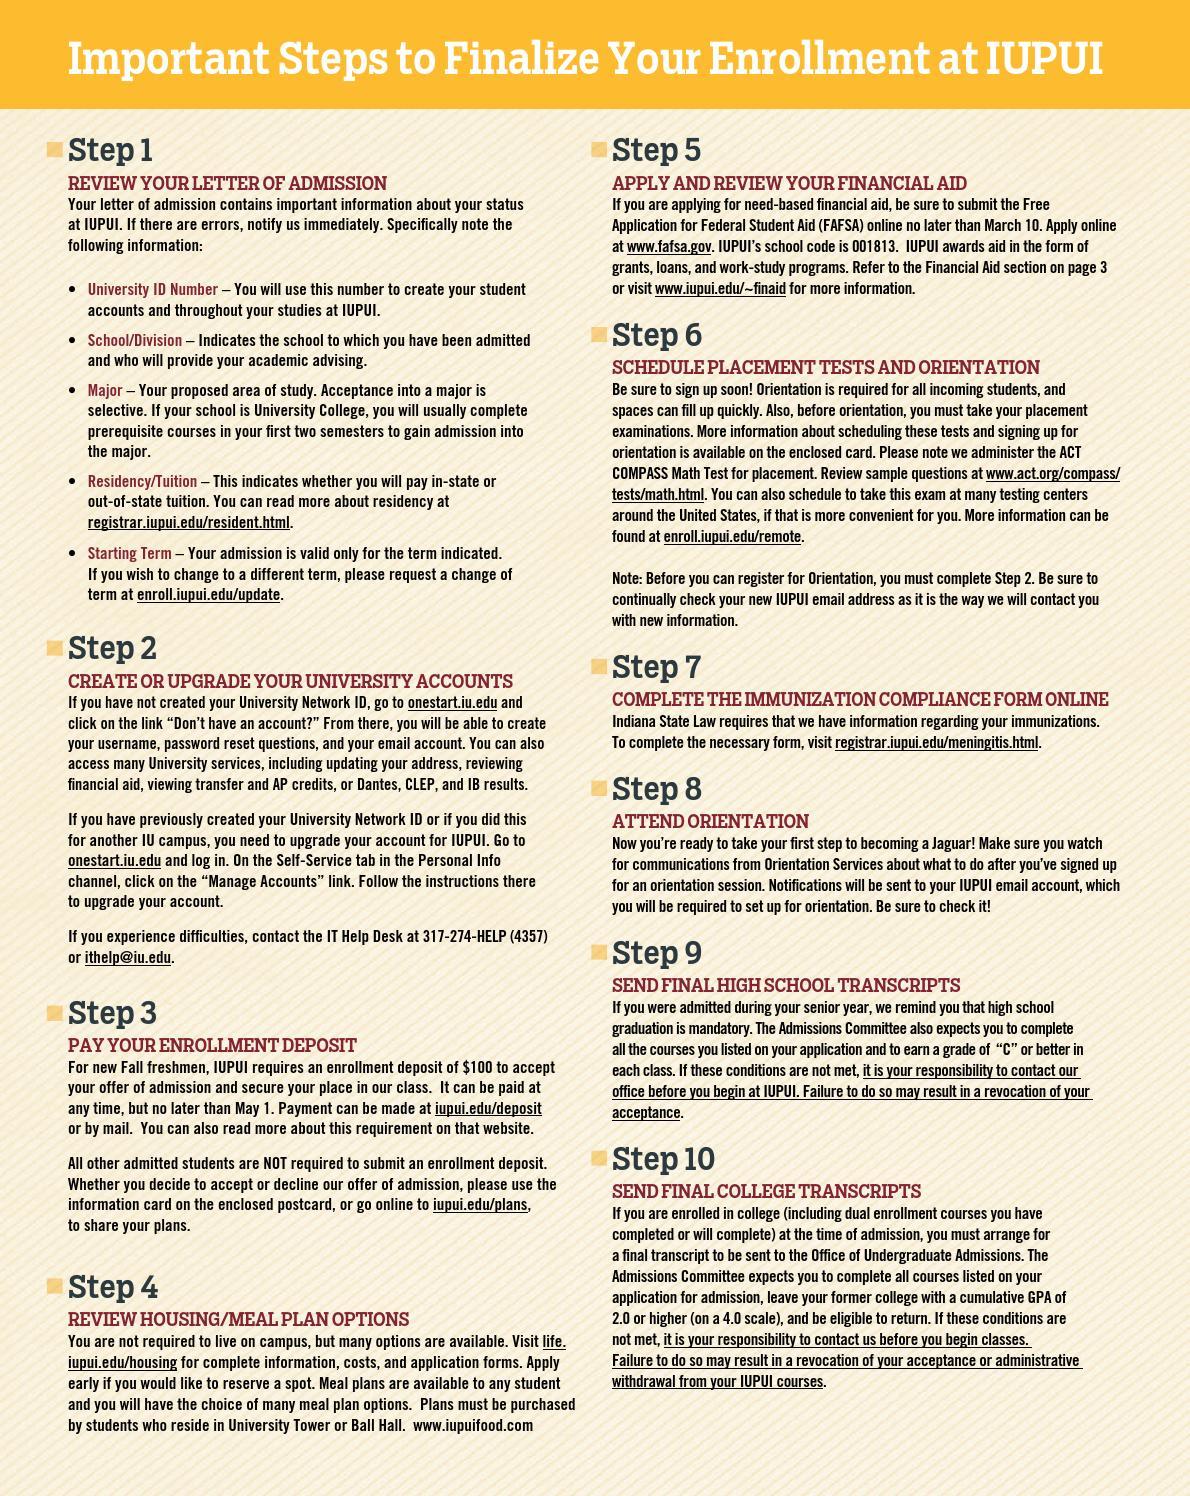 Iupui Financial Aid >> Iupui Enrollment Insert By Chuck Snider Design Issuu